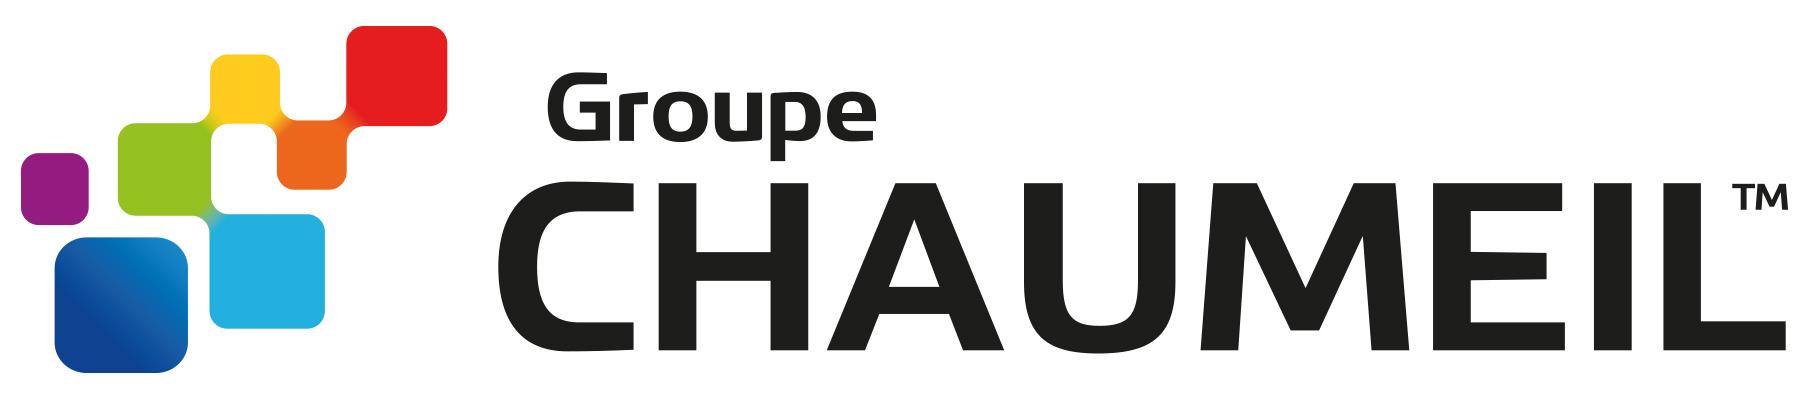 chaumeil-logo-2016-hori_5f7f1ed332eea.jpg